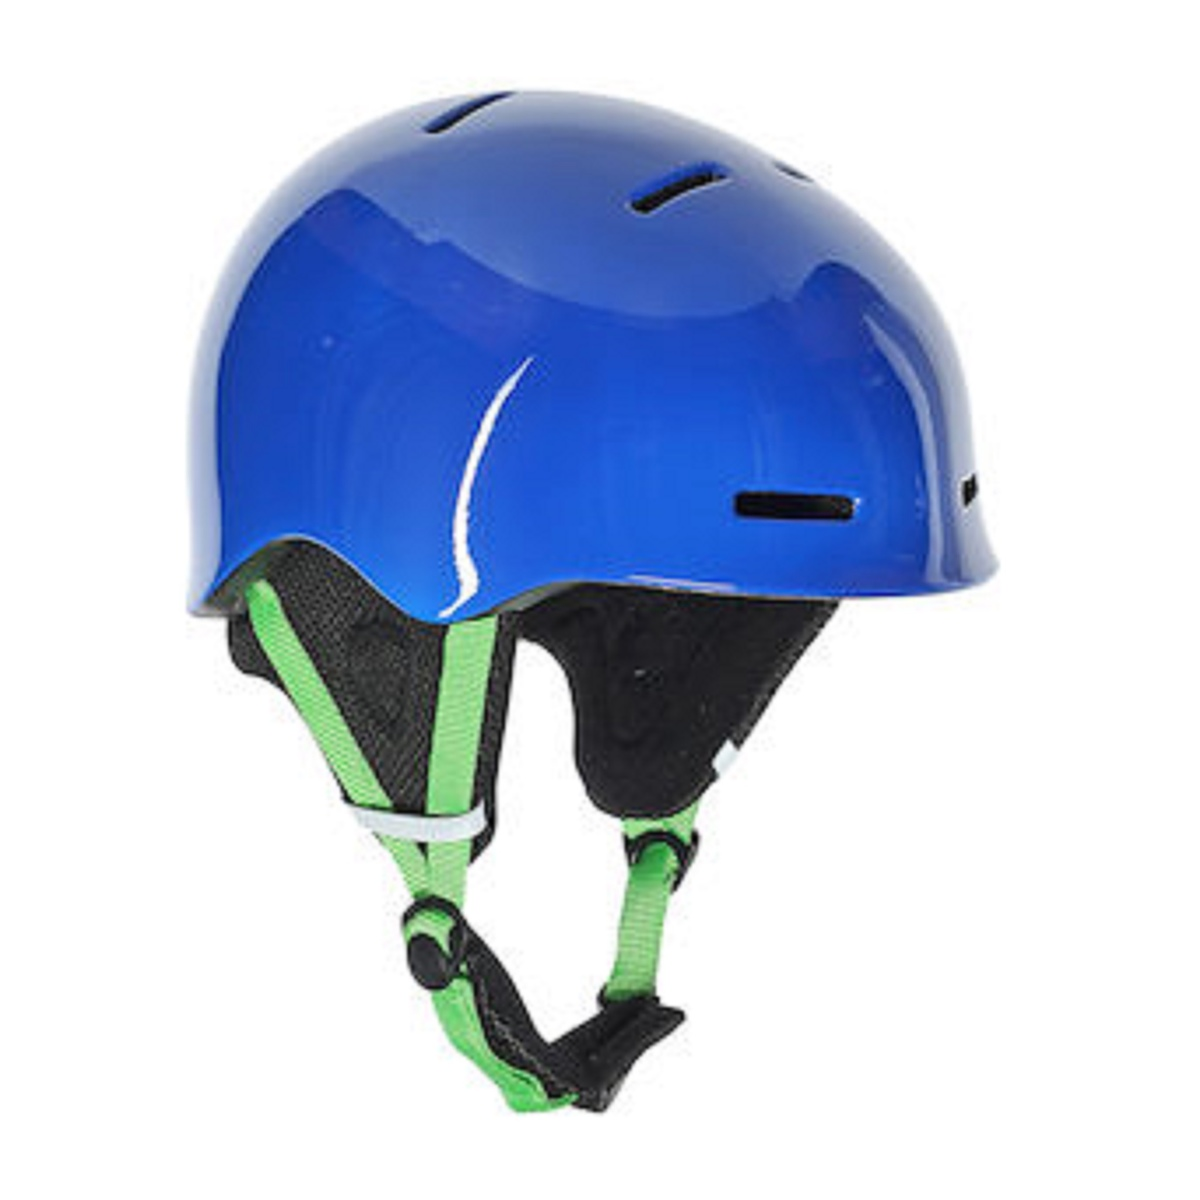 Prezzi Dainese Casco B-rocks Helmet